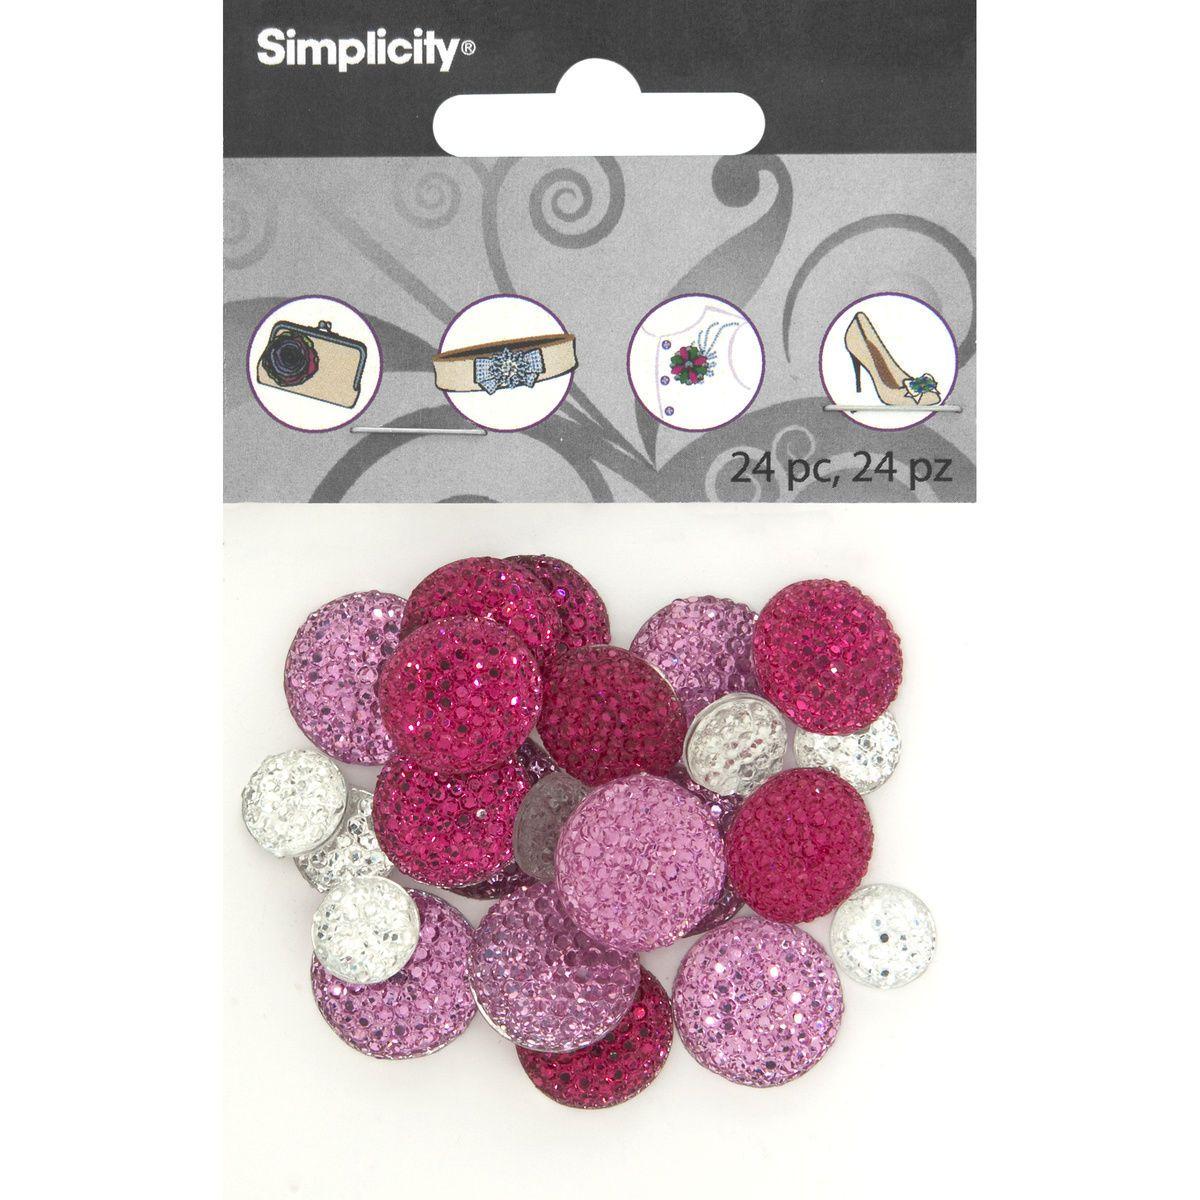 DIY Accessories Round Pave Gemstones, 24 pcs - Pink